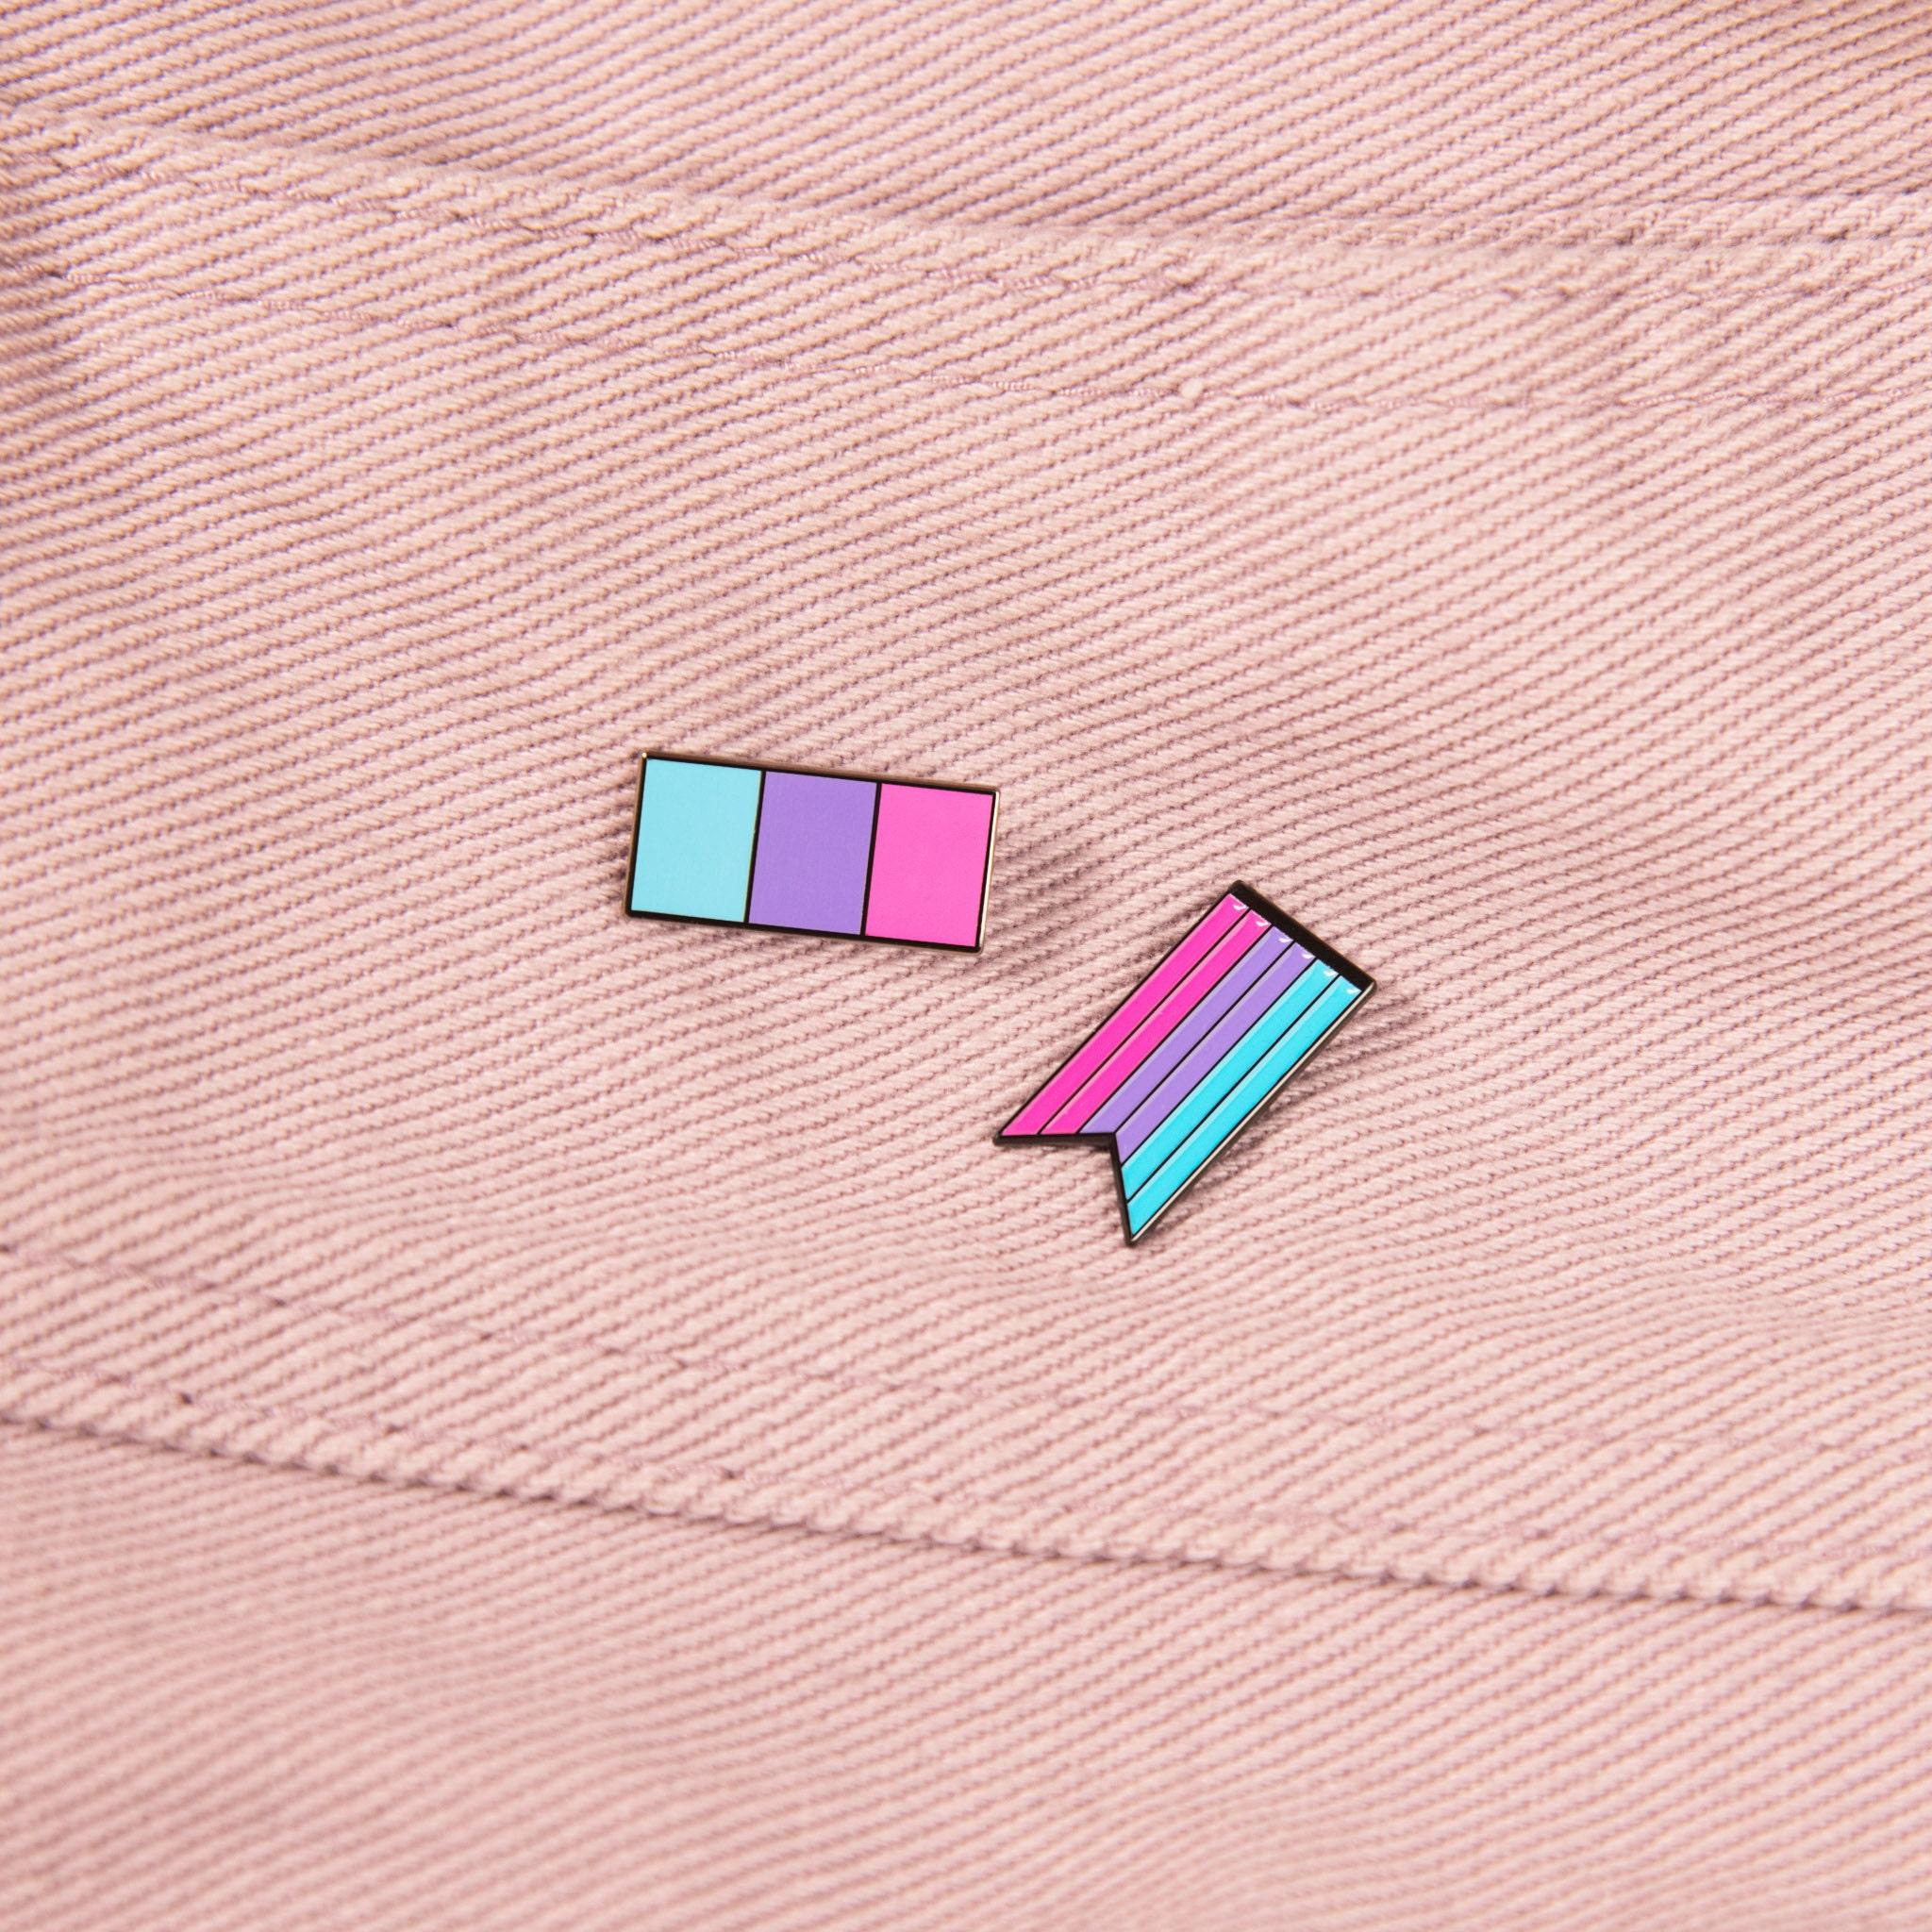 Androgyne Pride Accessories LGBT Queer Gender Identity